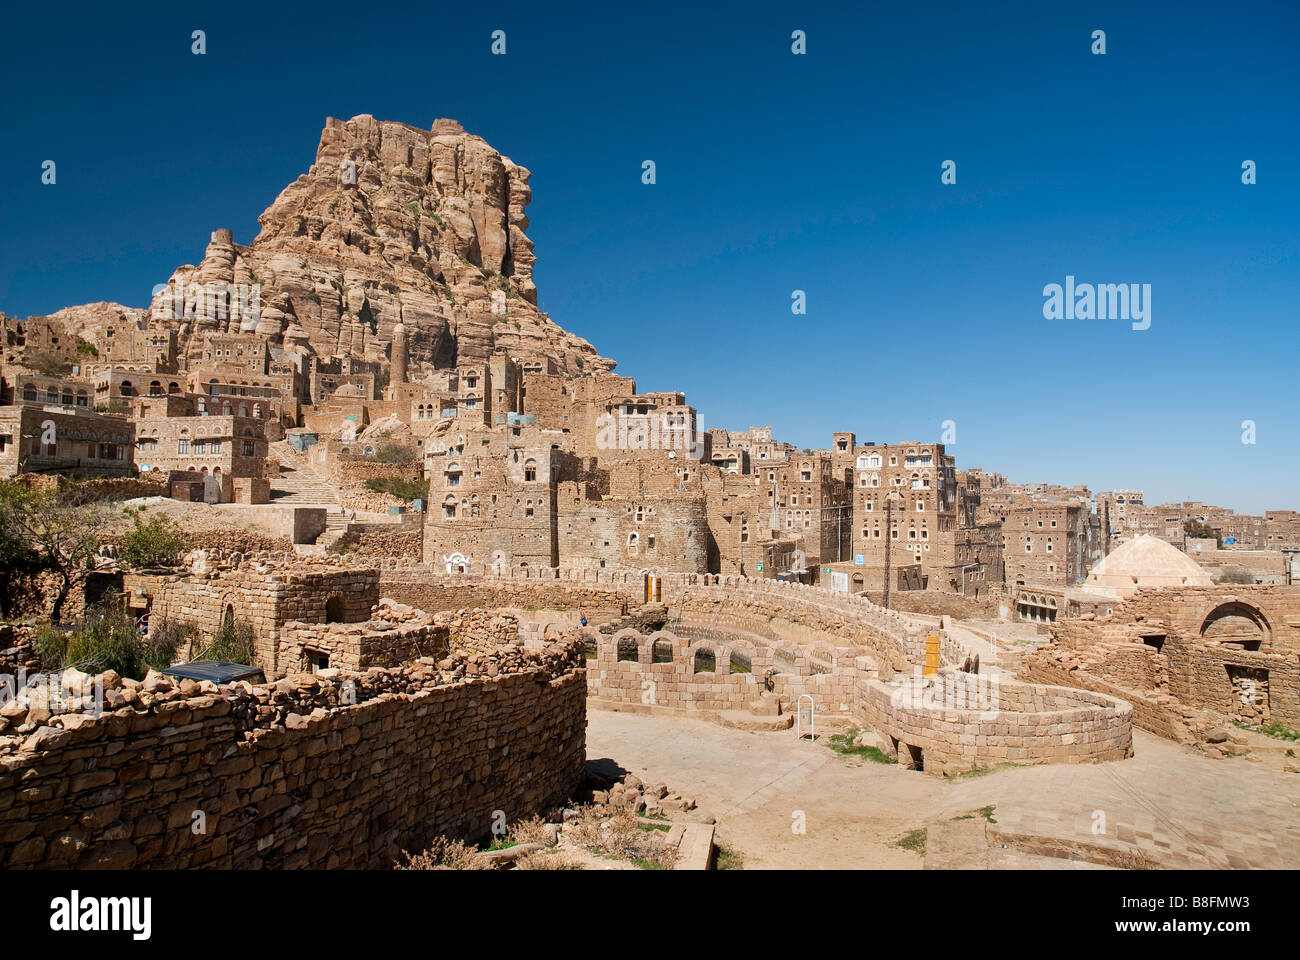 Shibam traditional mountain arab village yemen - Stock Image